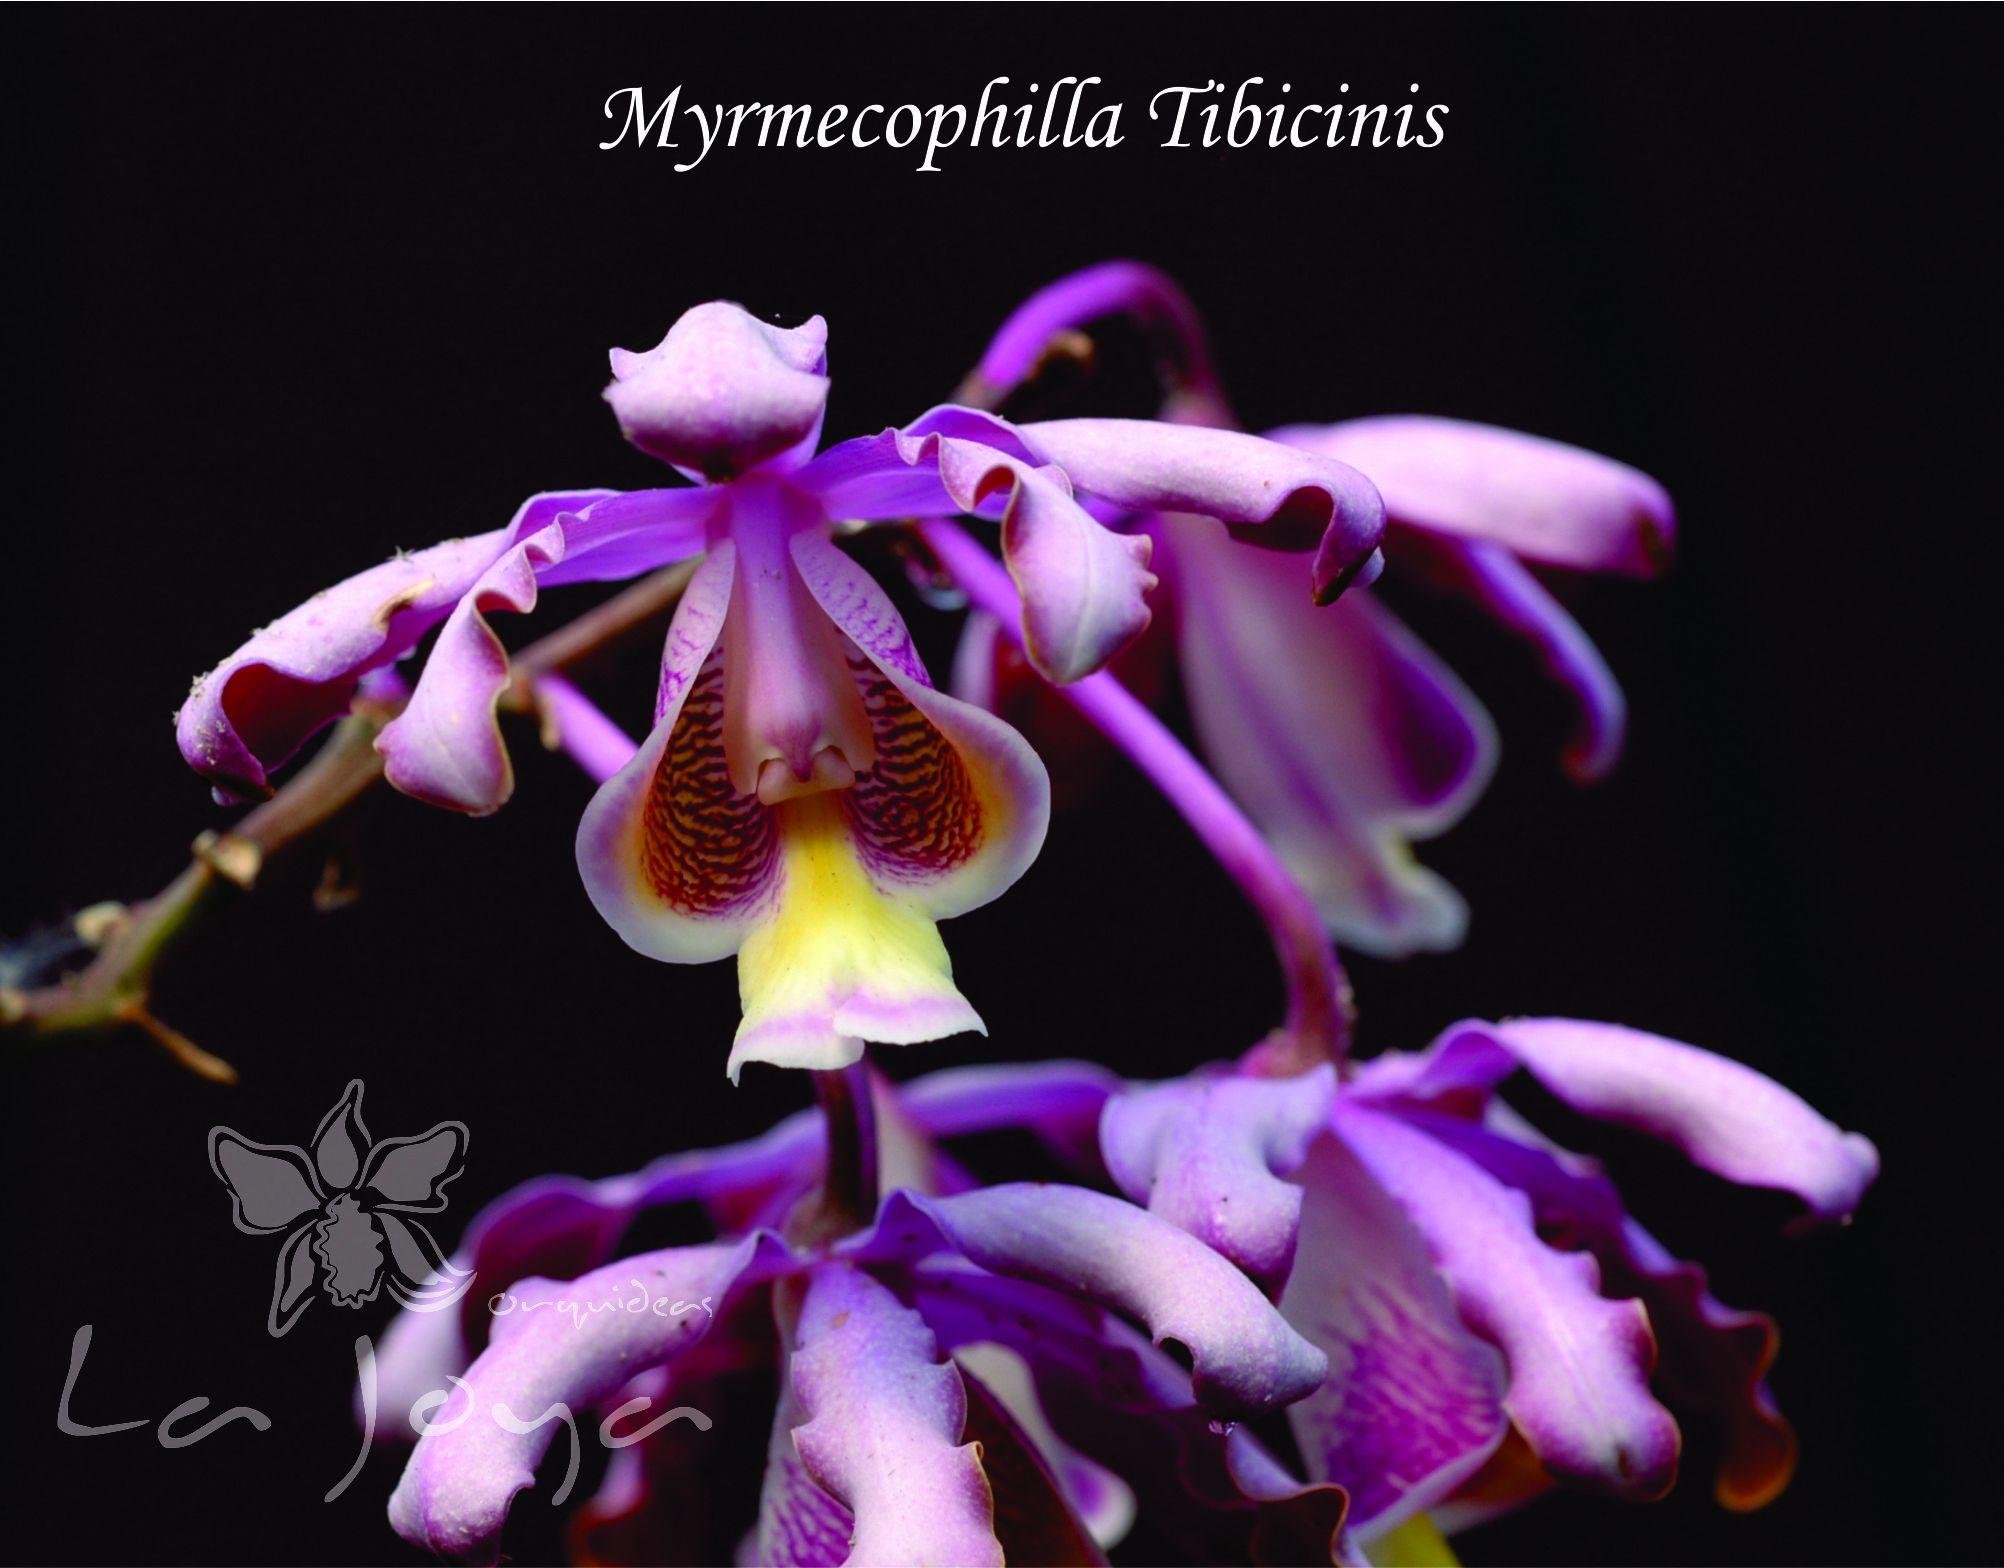 Myrmecophilla Tibicinis